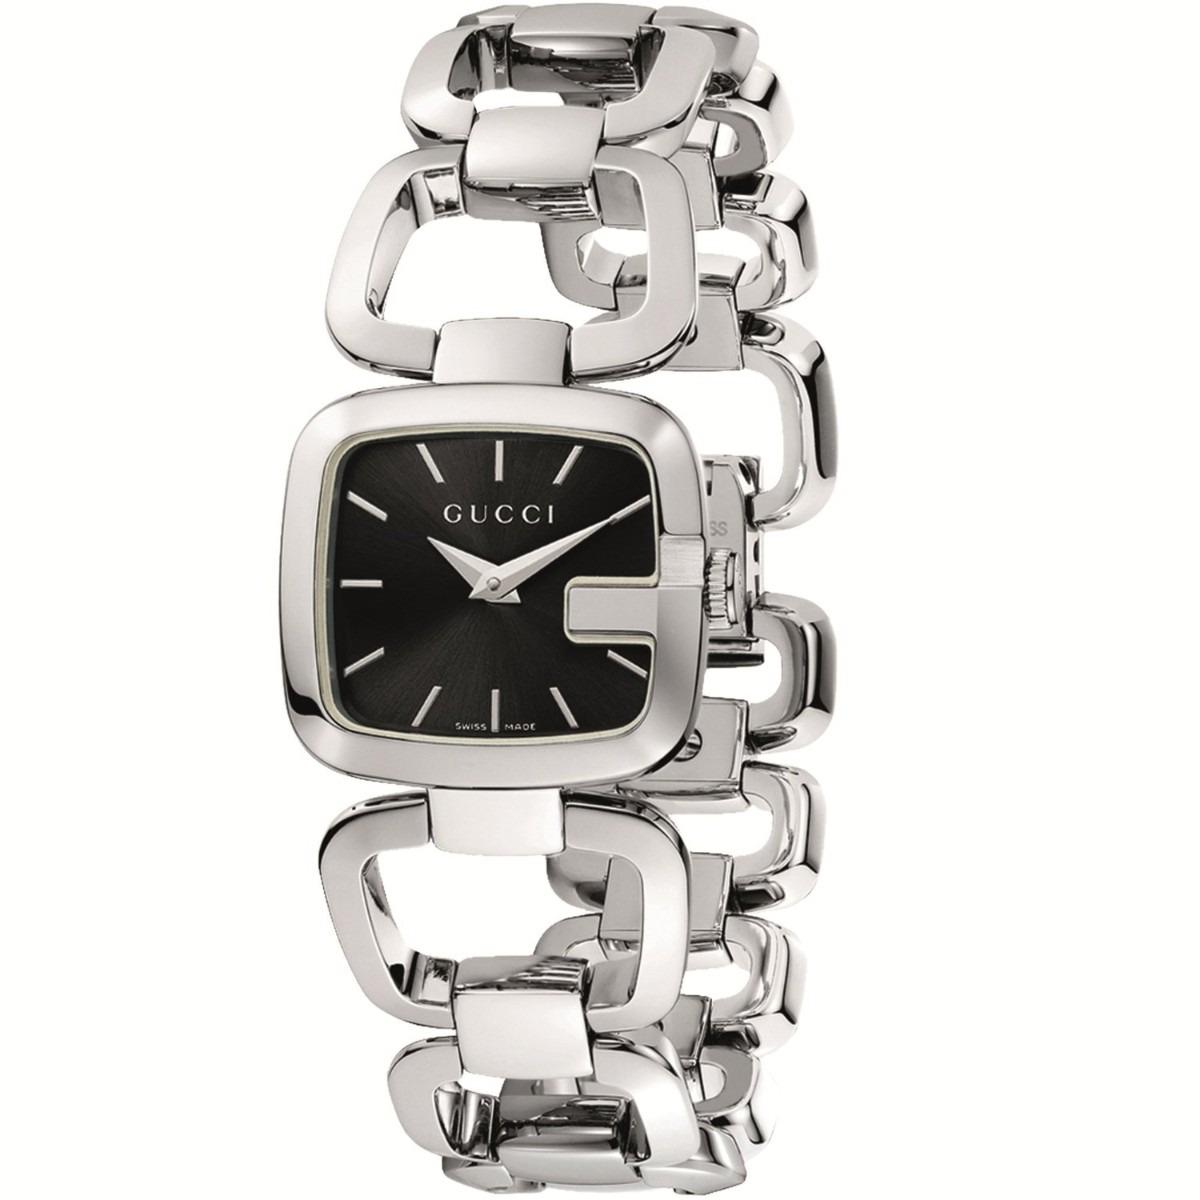 Precio de reloj gucci mujer original